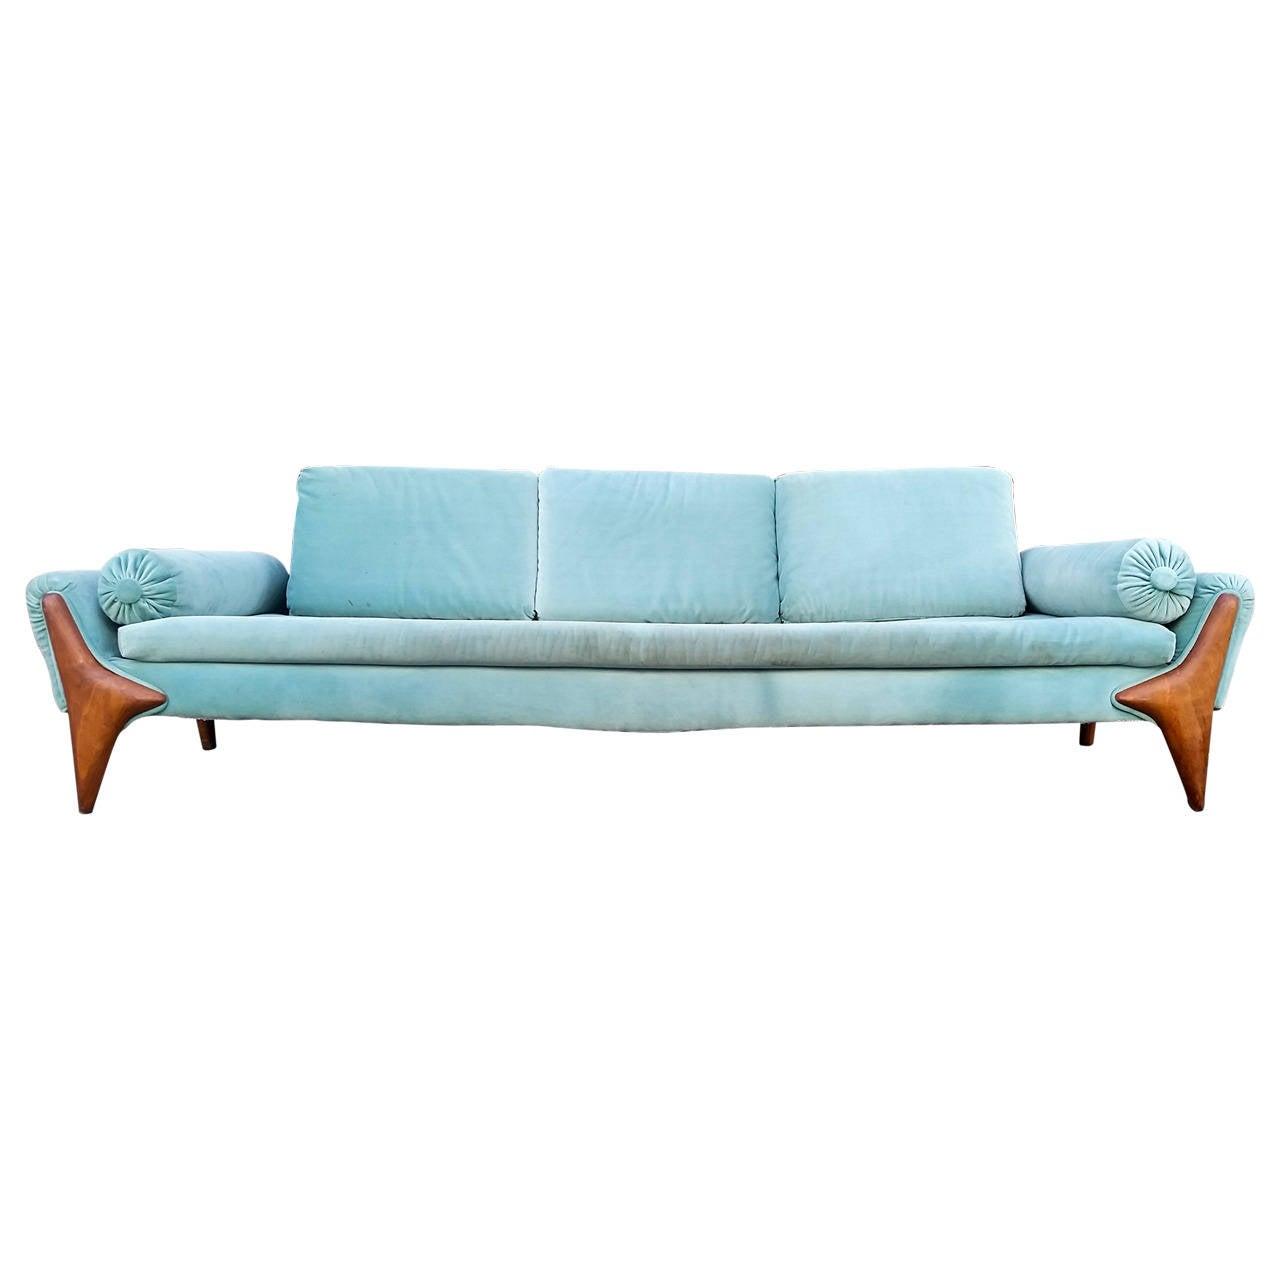 rare sculptural adrian pearsall gondola sofa at 1stdibs adrian pearsall sofas catalog adrian pearsall sofa ebay